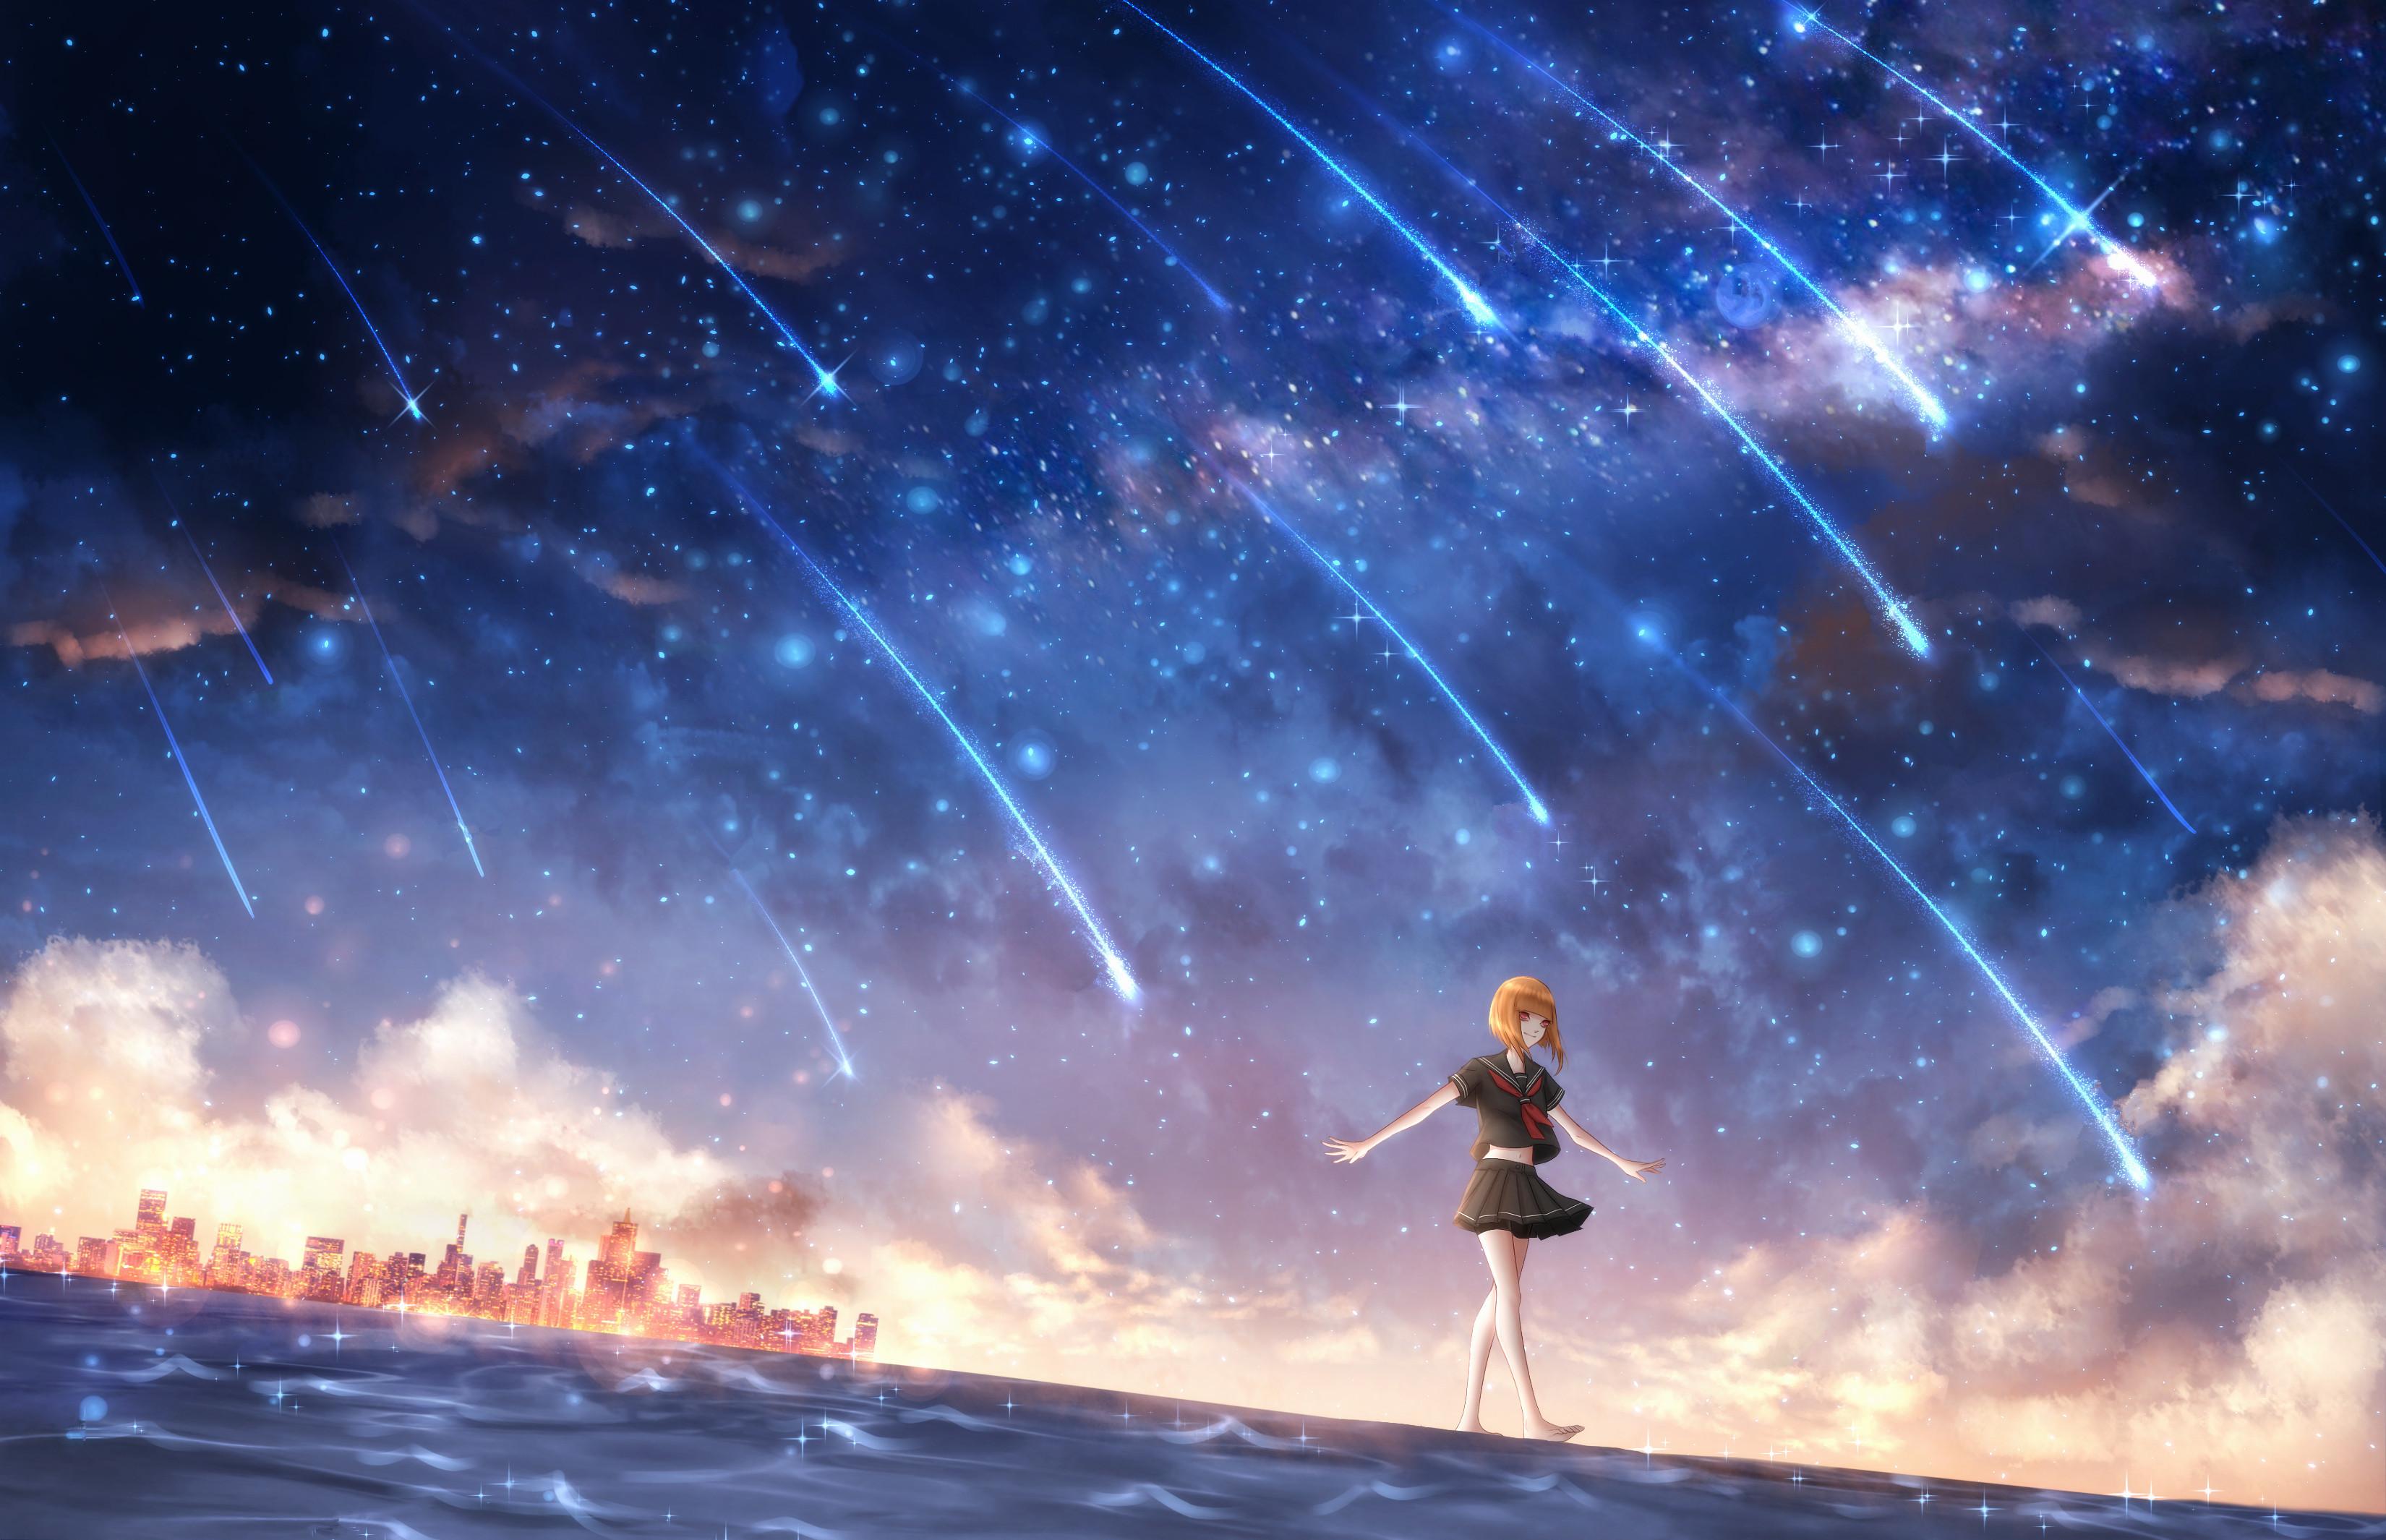 Anime Girl Looking At Sky Wallpaper 배경 화면 애니메이션 소녀들 별이 빛나는 밤 3300x2130 Hellcome 1294735